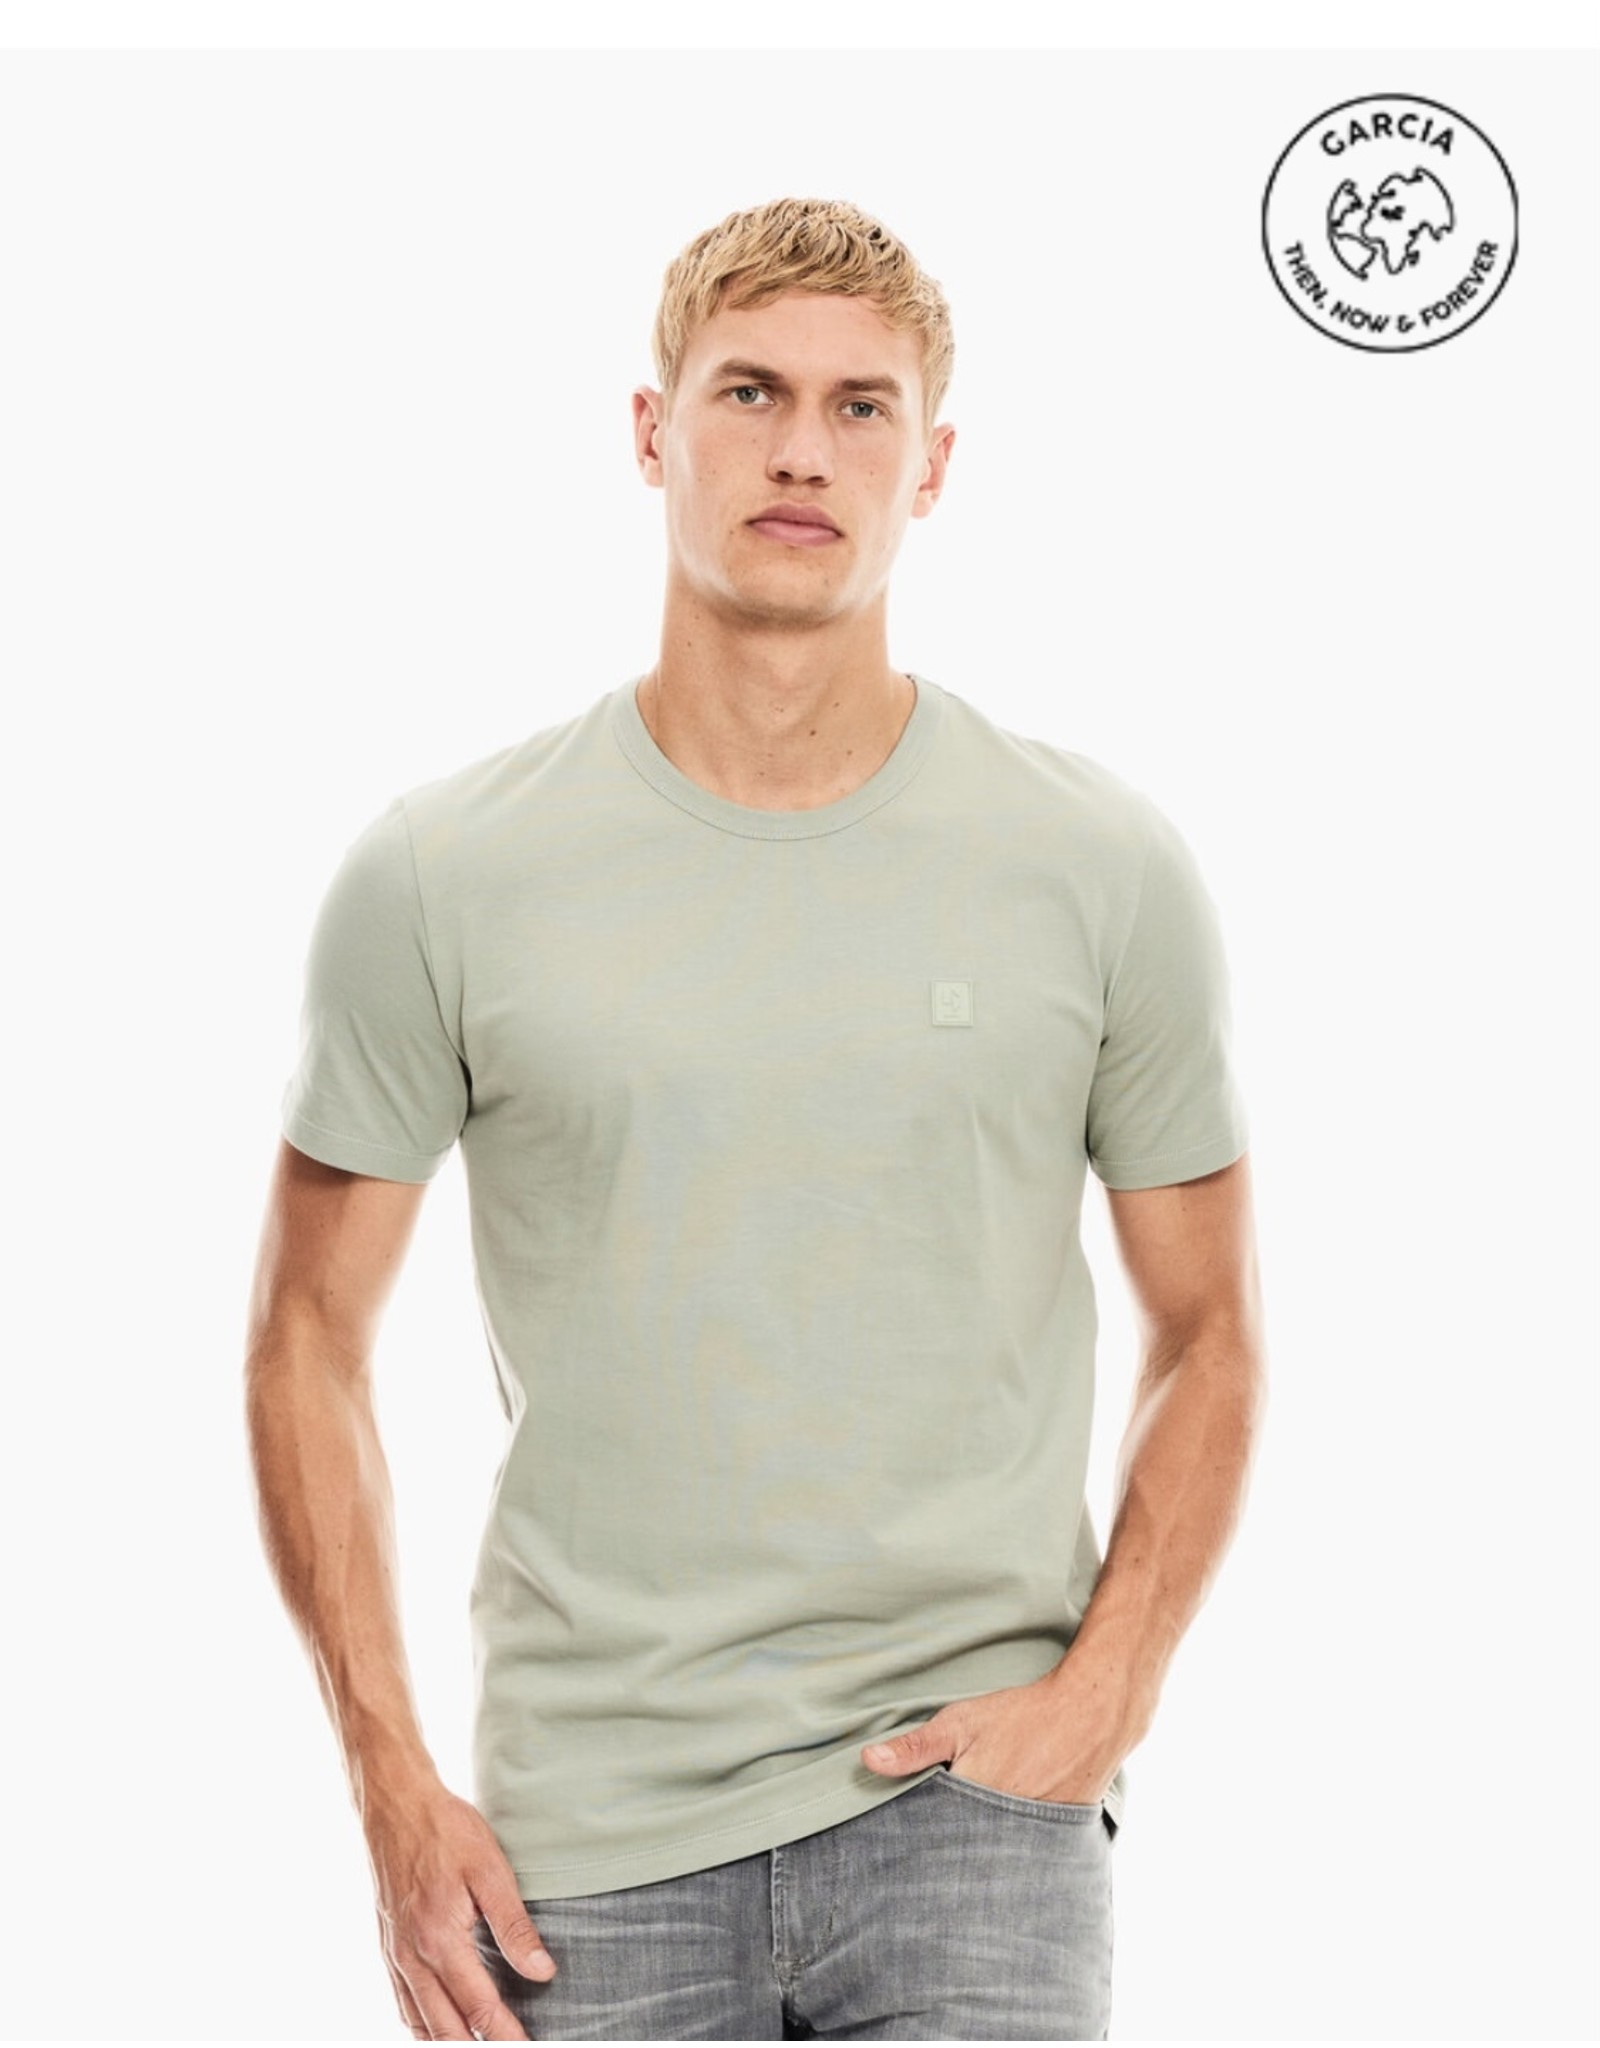 Garcia Garcia Mens T Shirt 0203